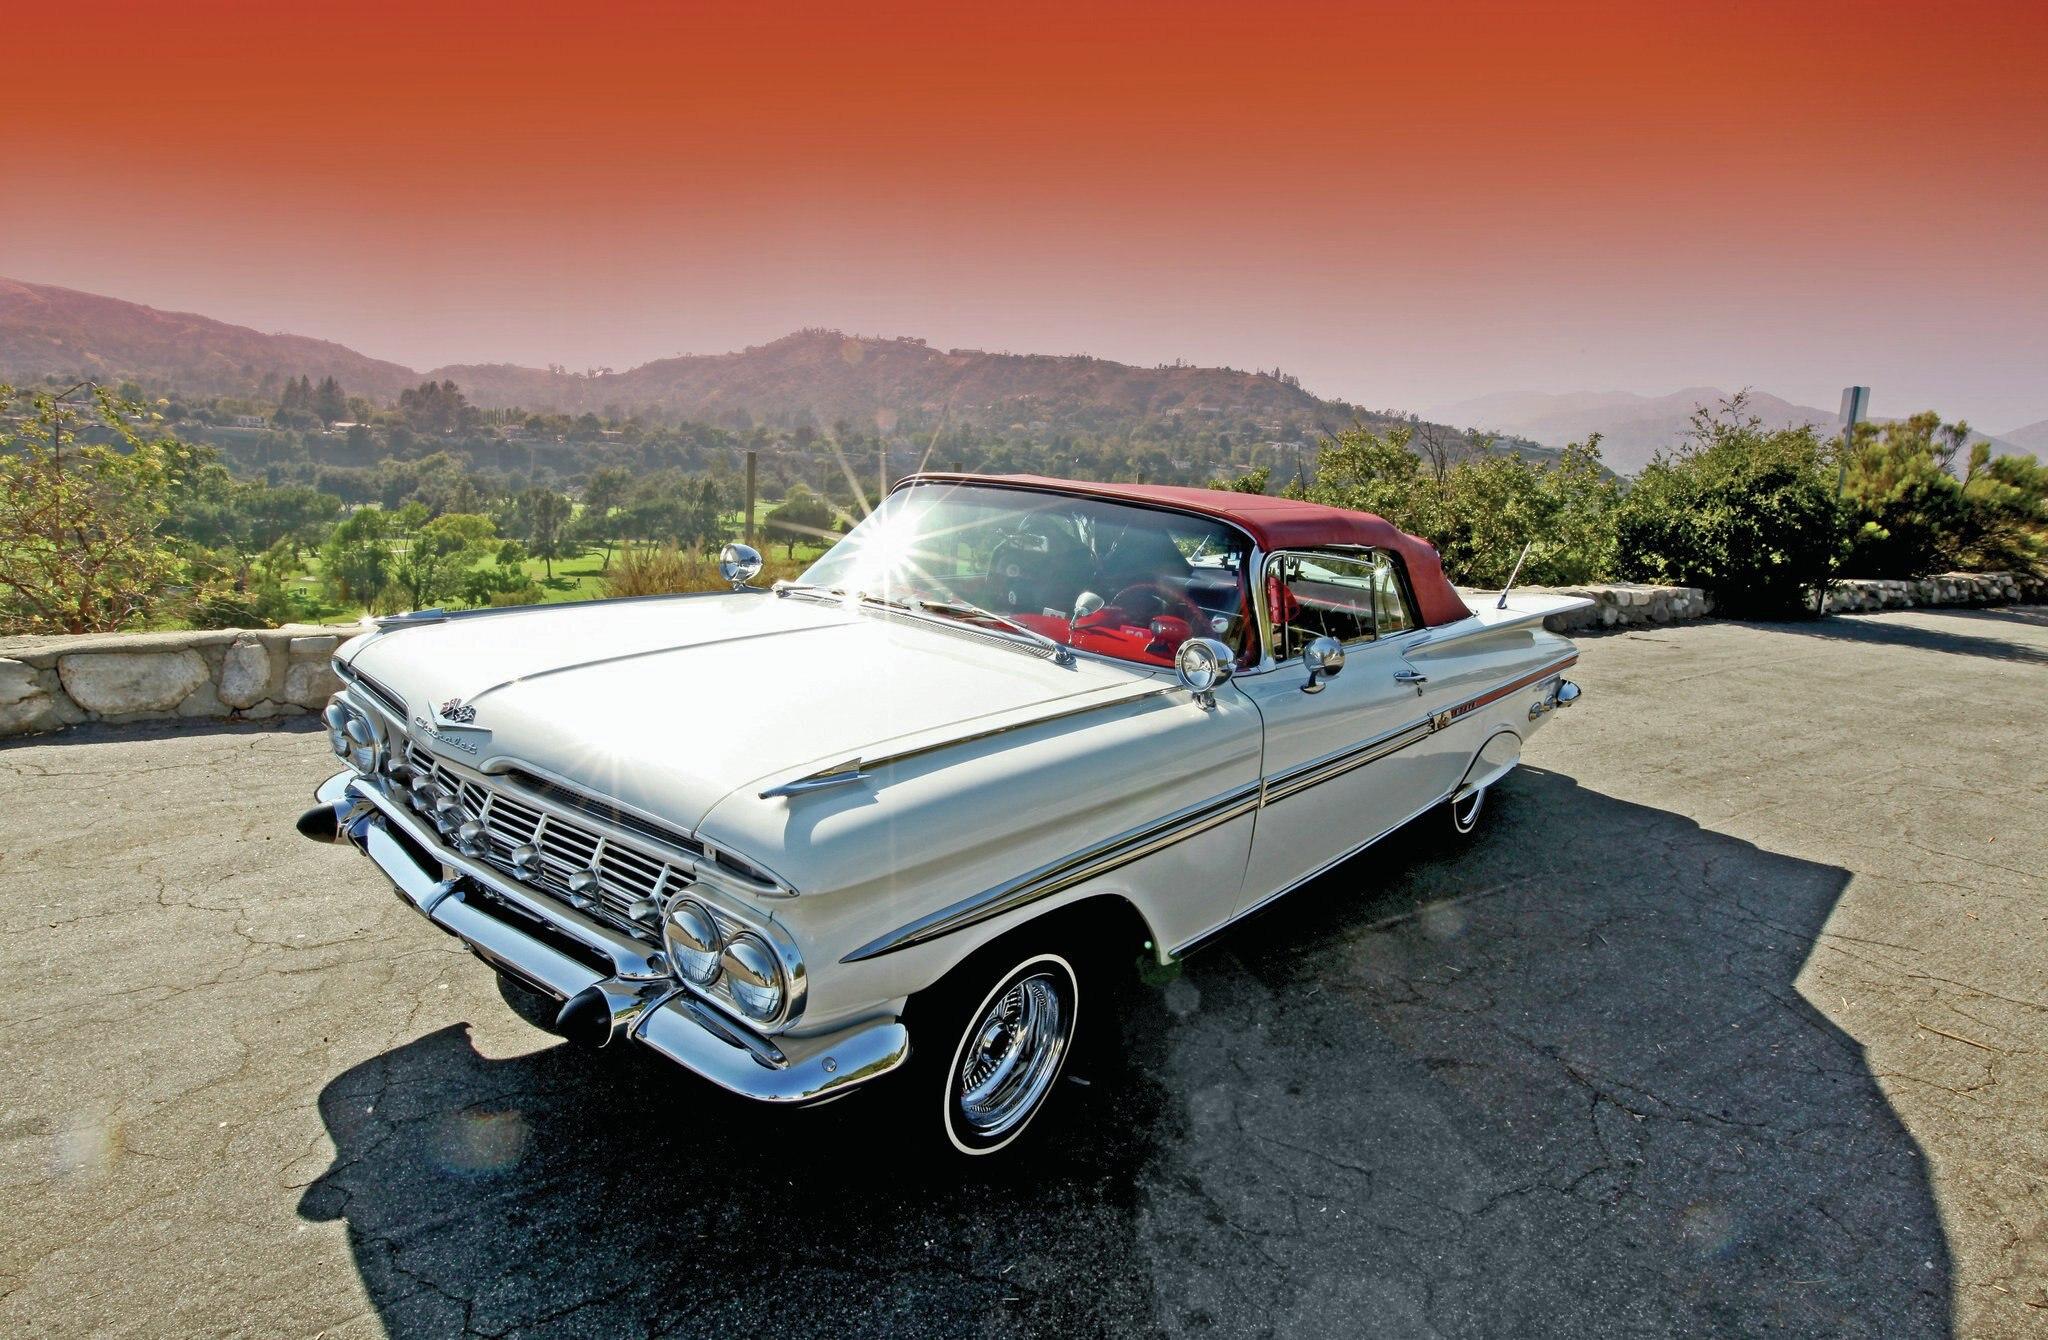 1959 impala convertible craigslist. Black Bedroom Furniture Sets. Home Design Ideas